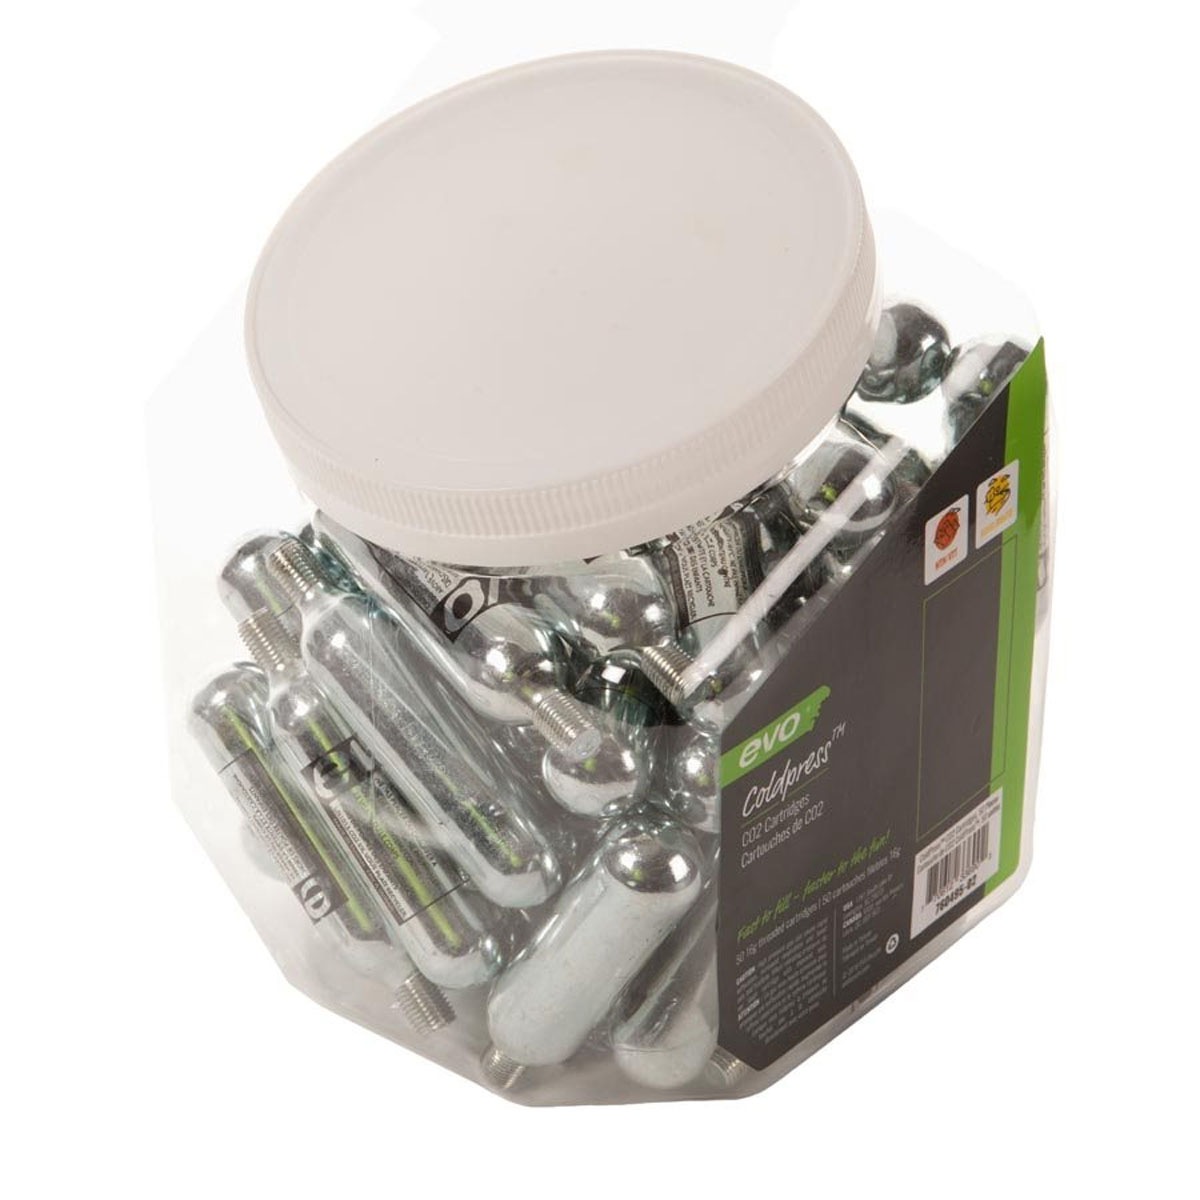 EVO 16g Threaded CO2 Cartridge - Jar of 50 - 760495-02